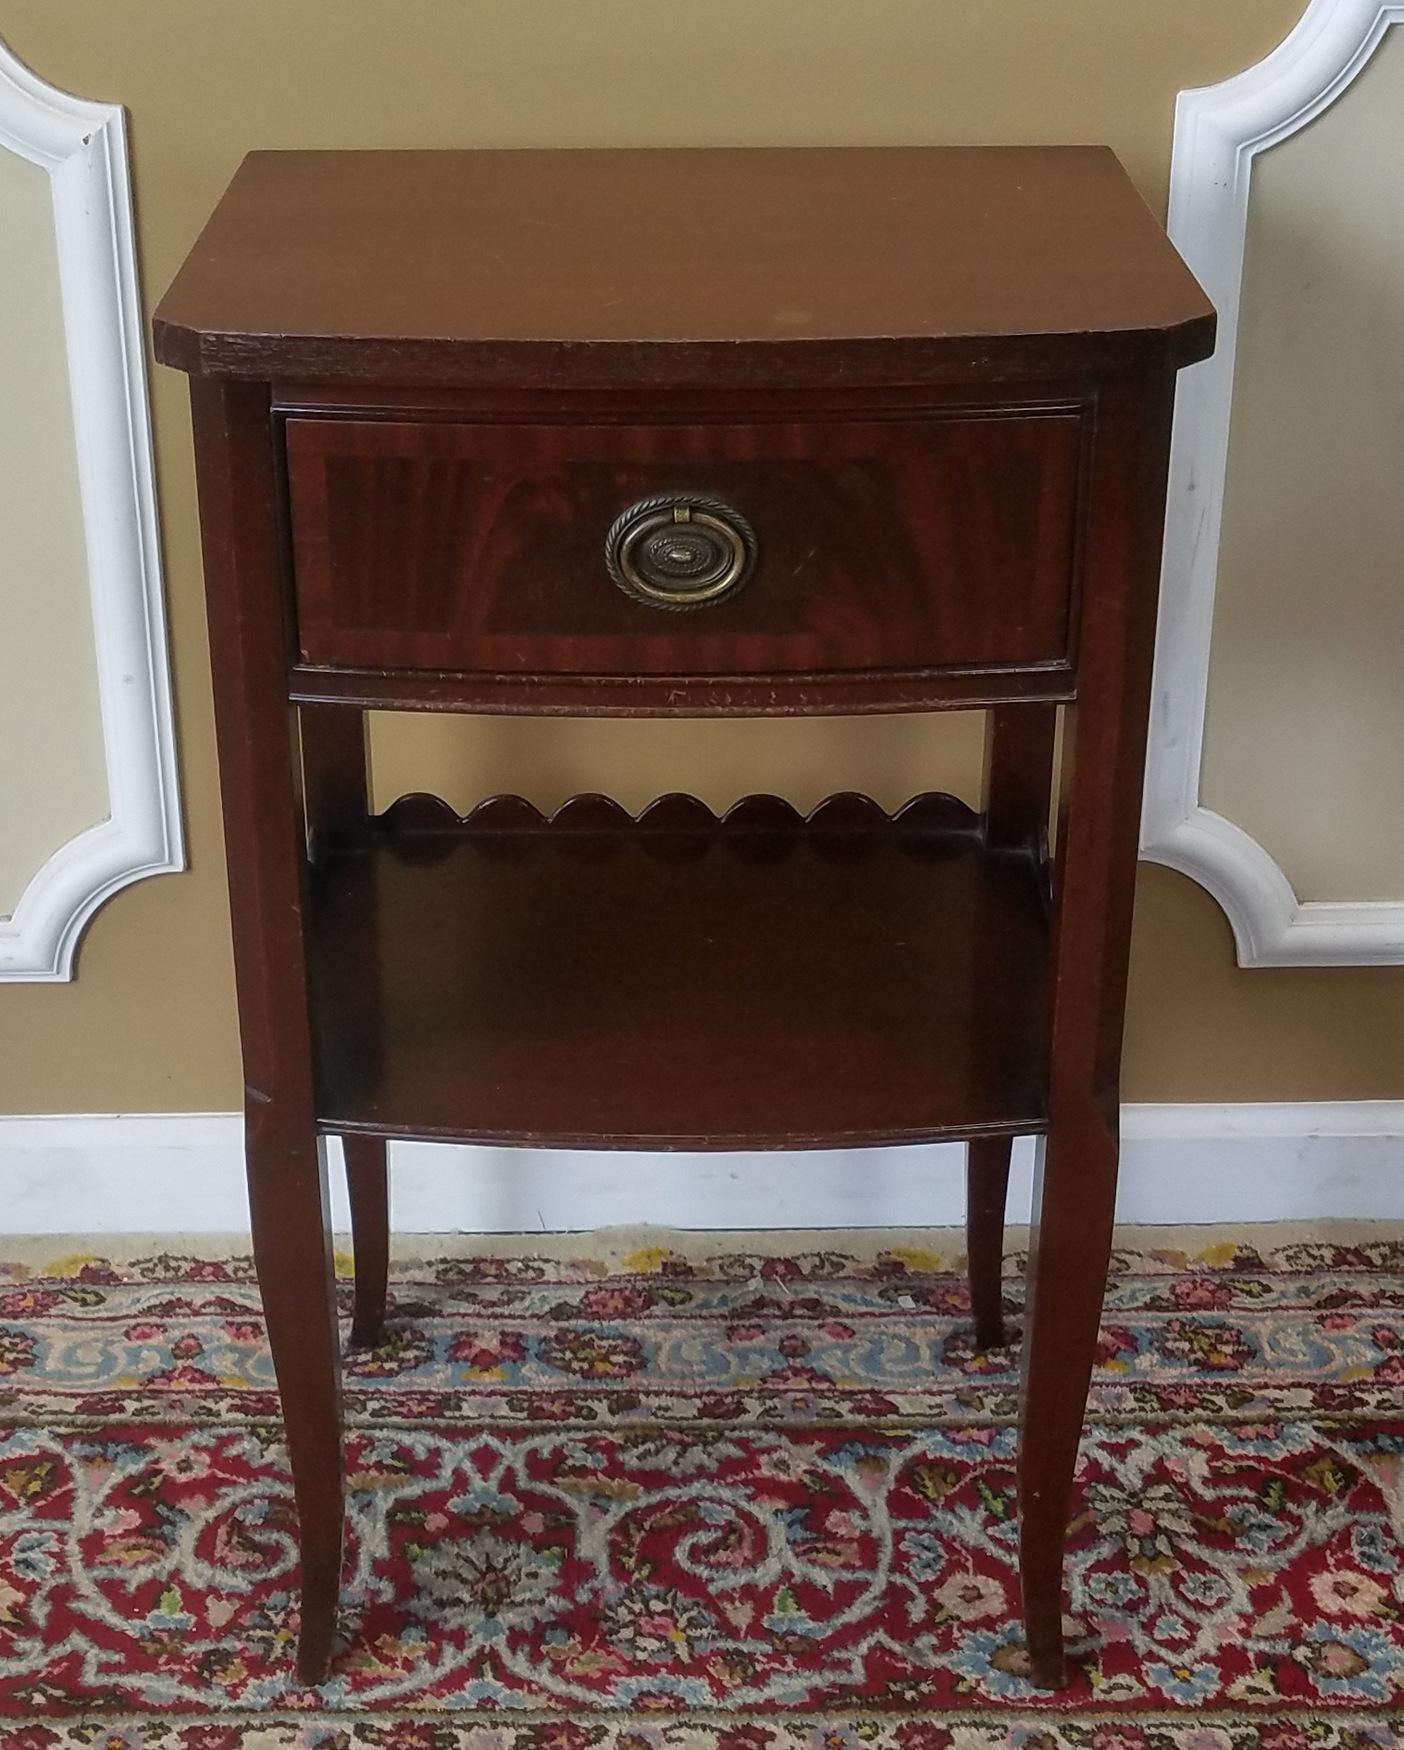 Rway Northern Furniture Co Mahogany Sheraton Style Bedroom Nightstand    Image 3 Of 8